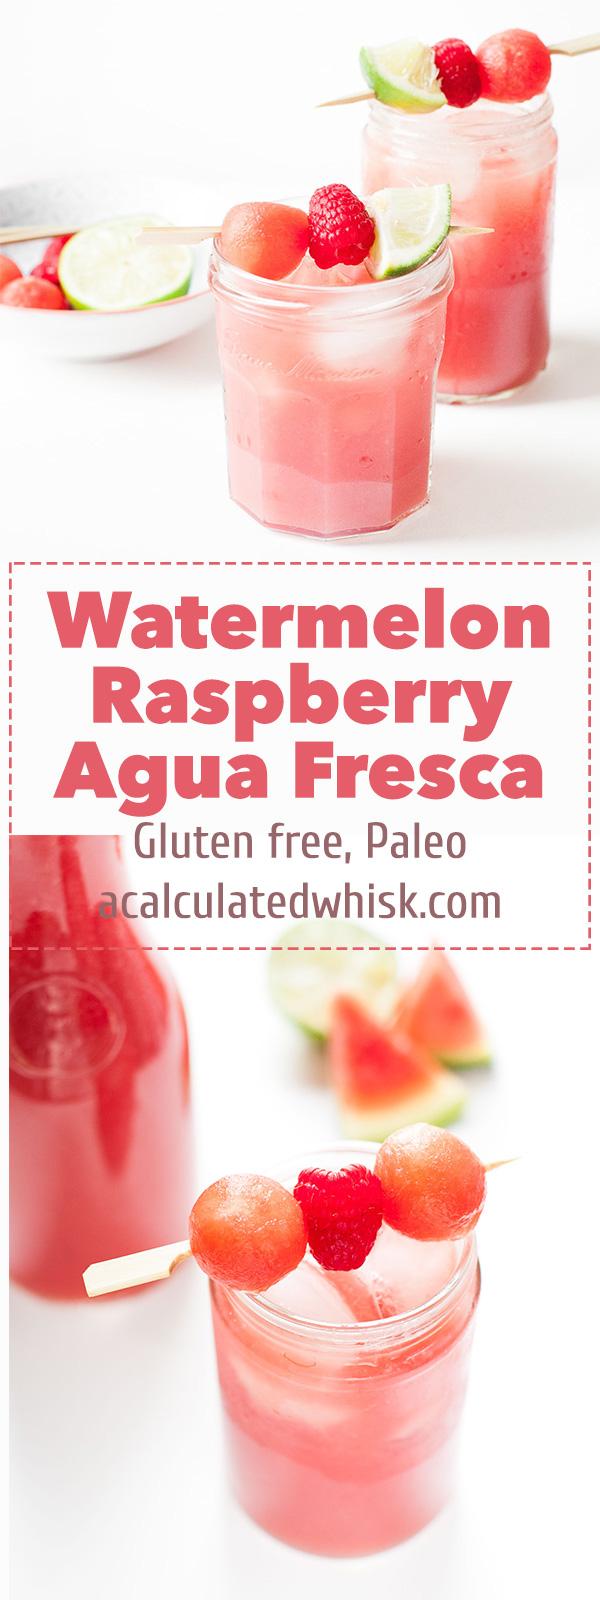 Watermelon Raspberry Agua Fresca | acalculatedwhisk.com